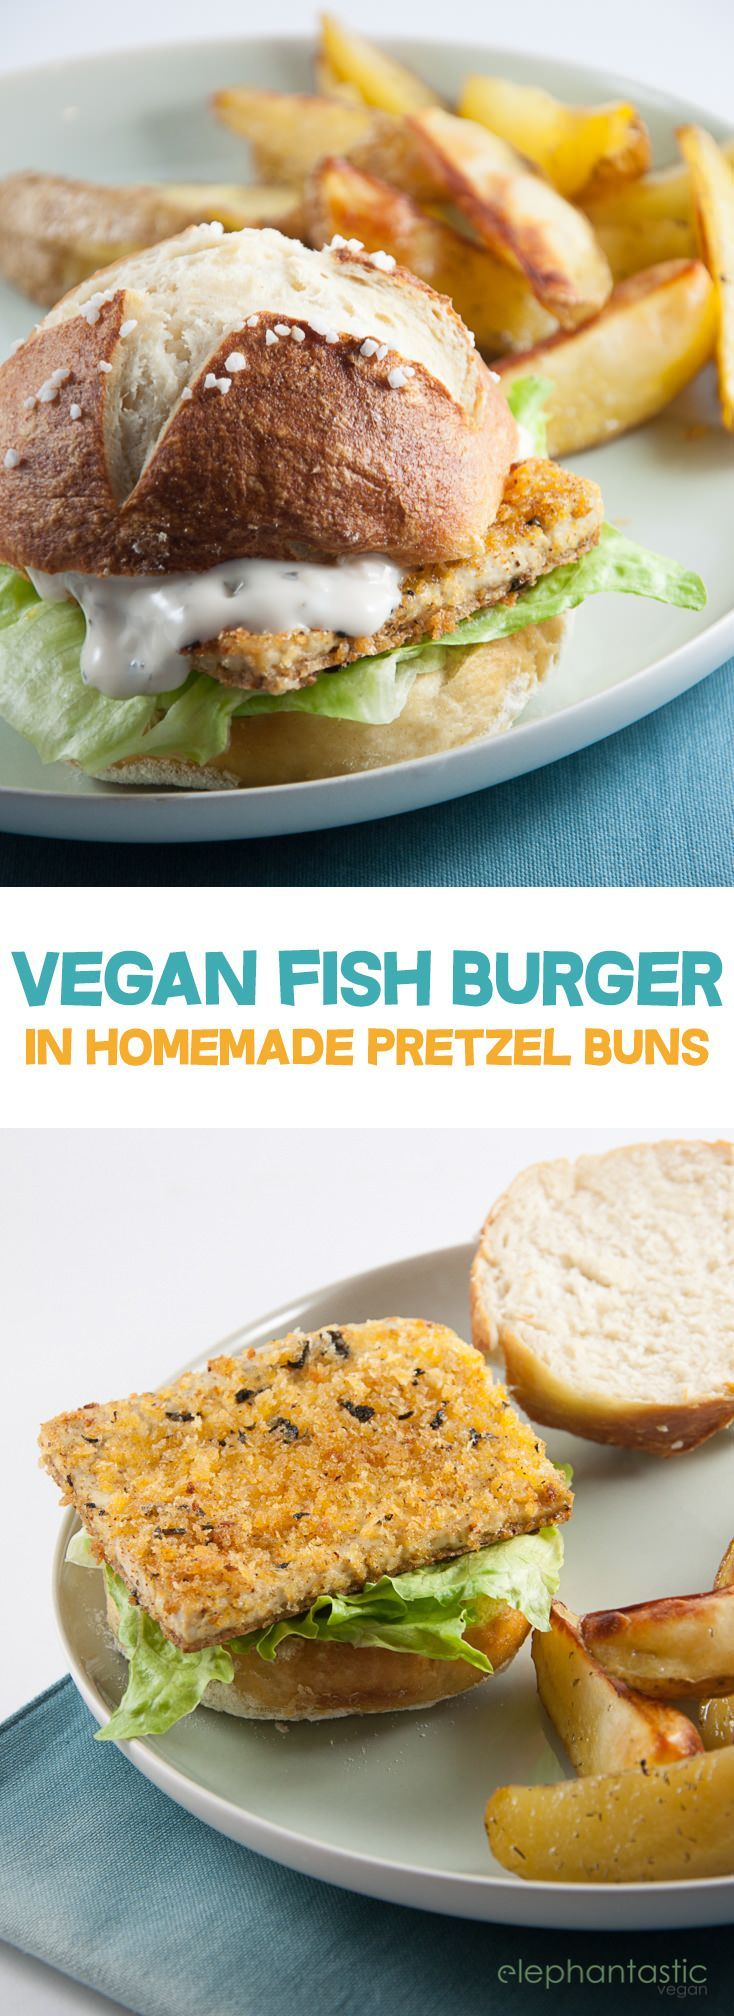 Vegan Fish Burger with homemade Pretzel Rolls | http://ElephantasticVegan.com